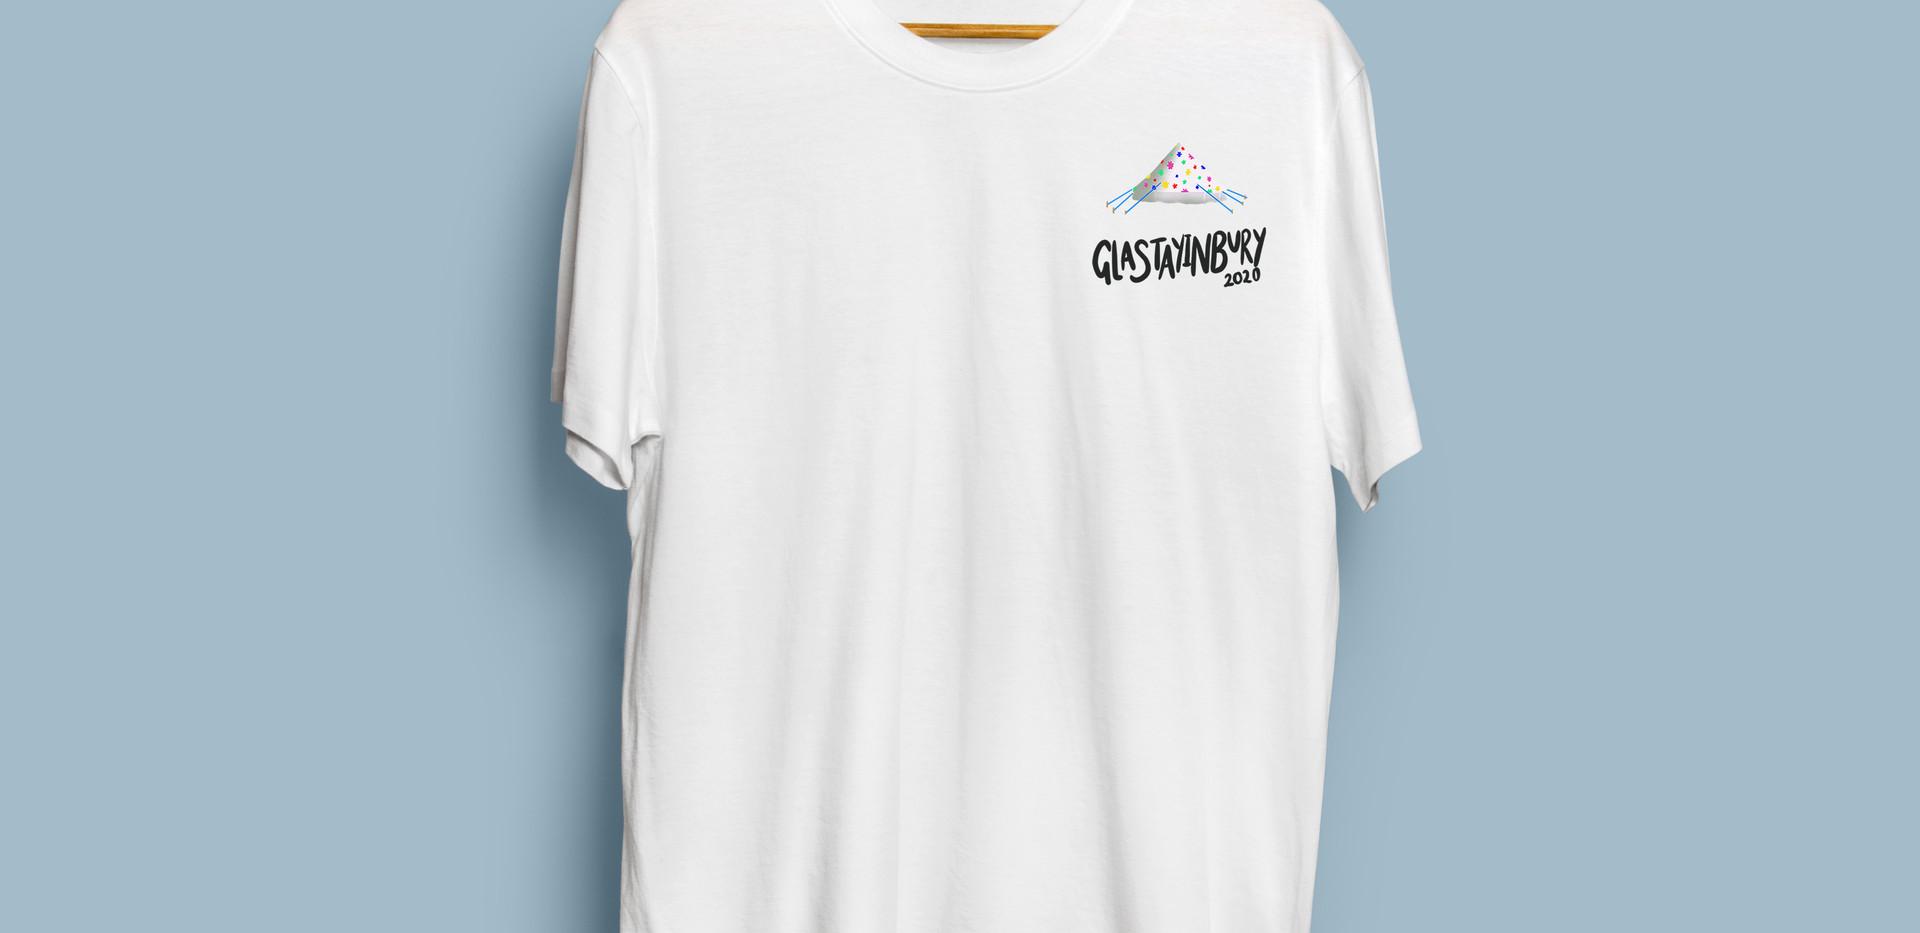 Glastayinbury White Tent T-Shirt